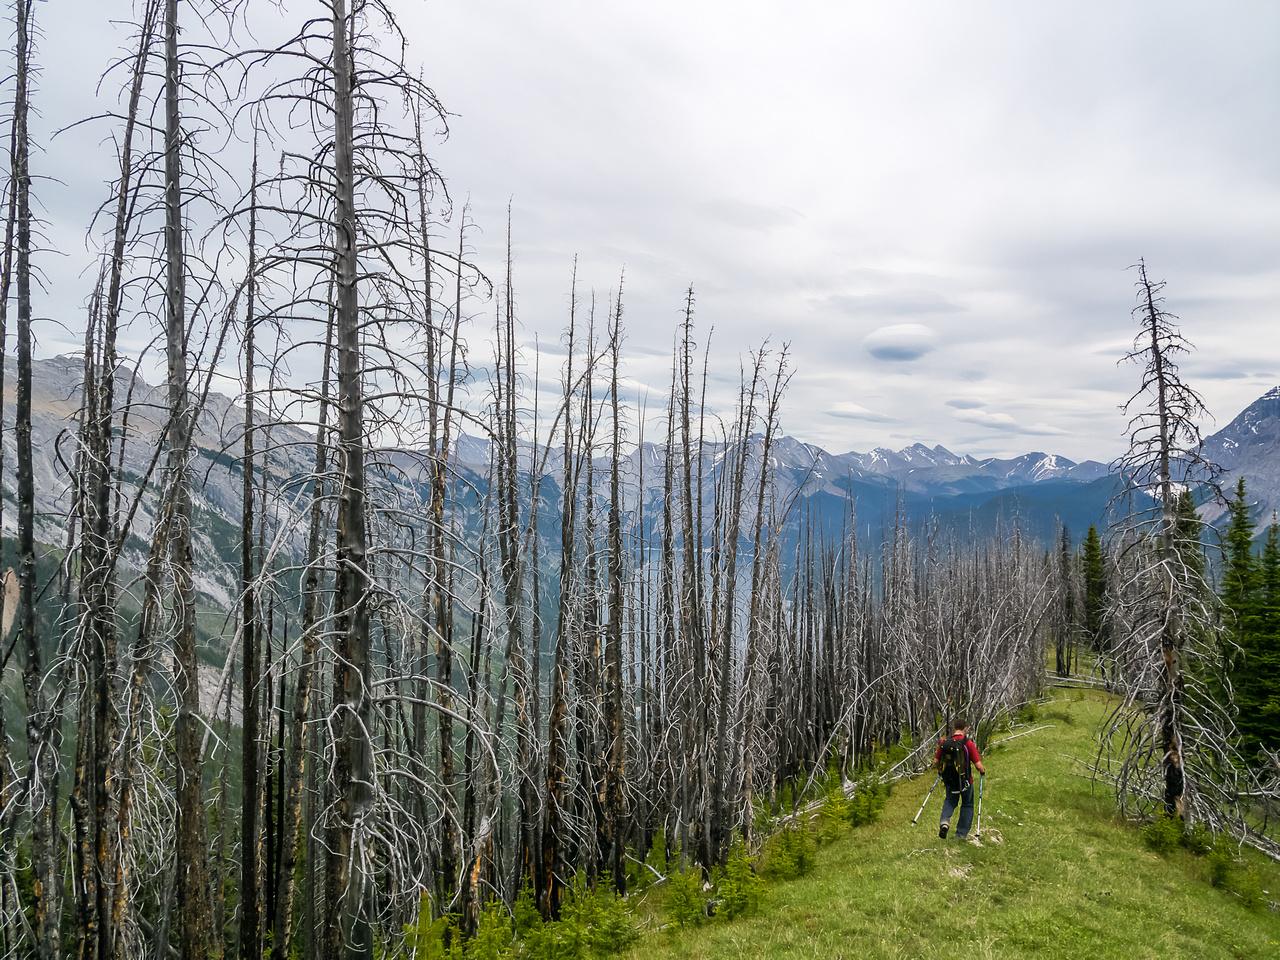 A pleasant stroll through dead forest - an old burn site.